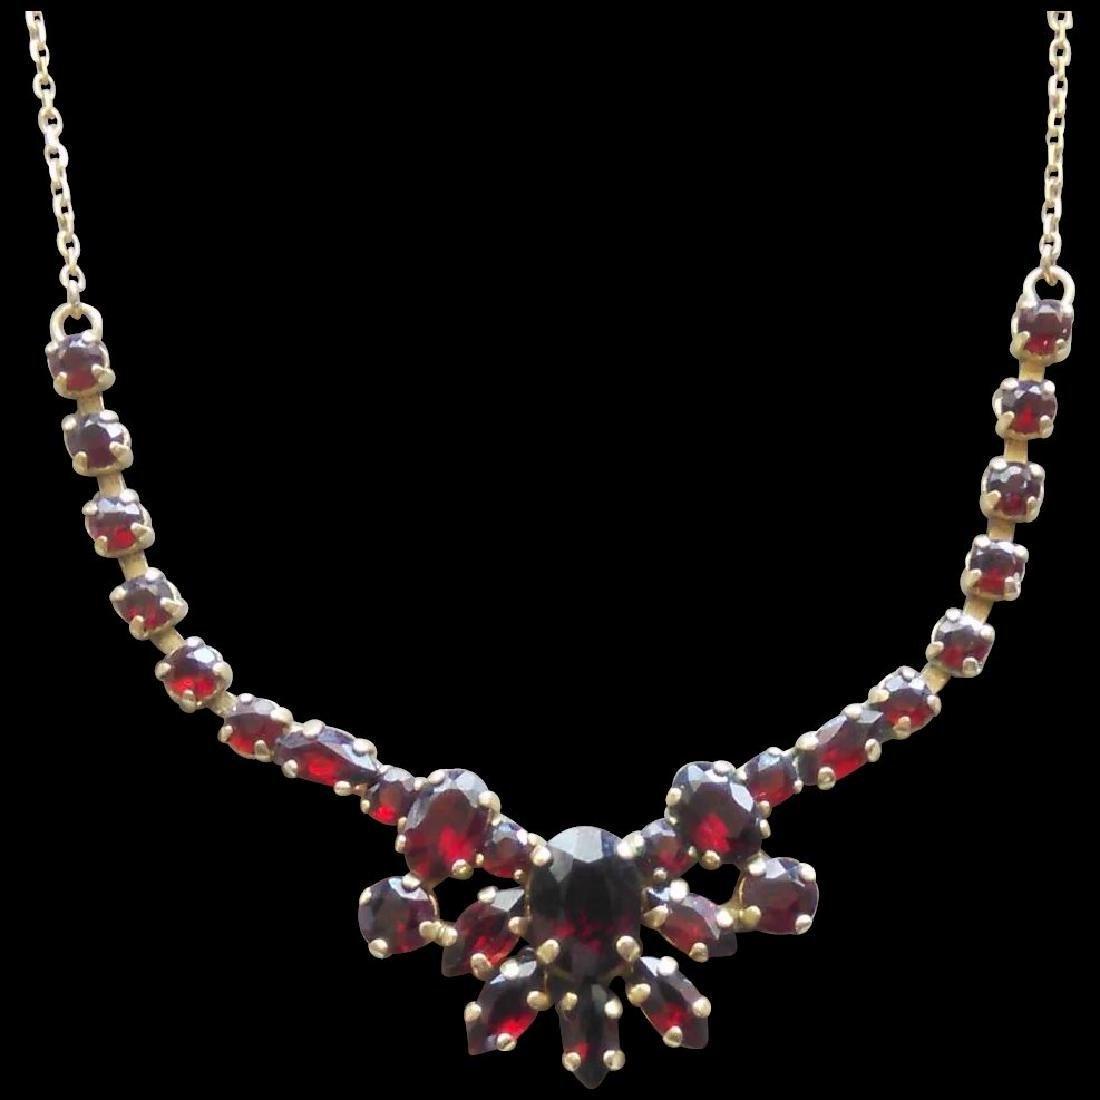 Vintage 24K Yellow Gold Red Garnet Necklace